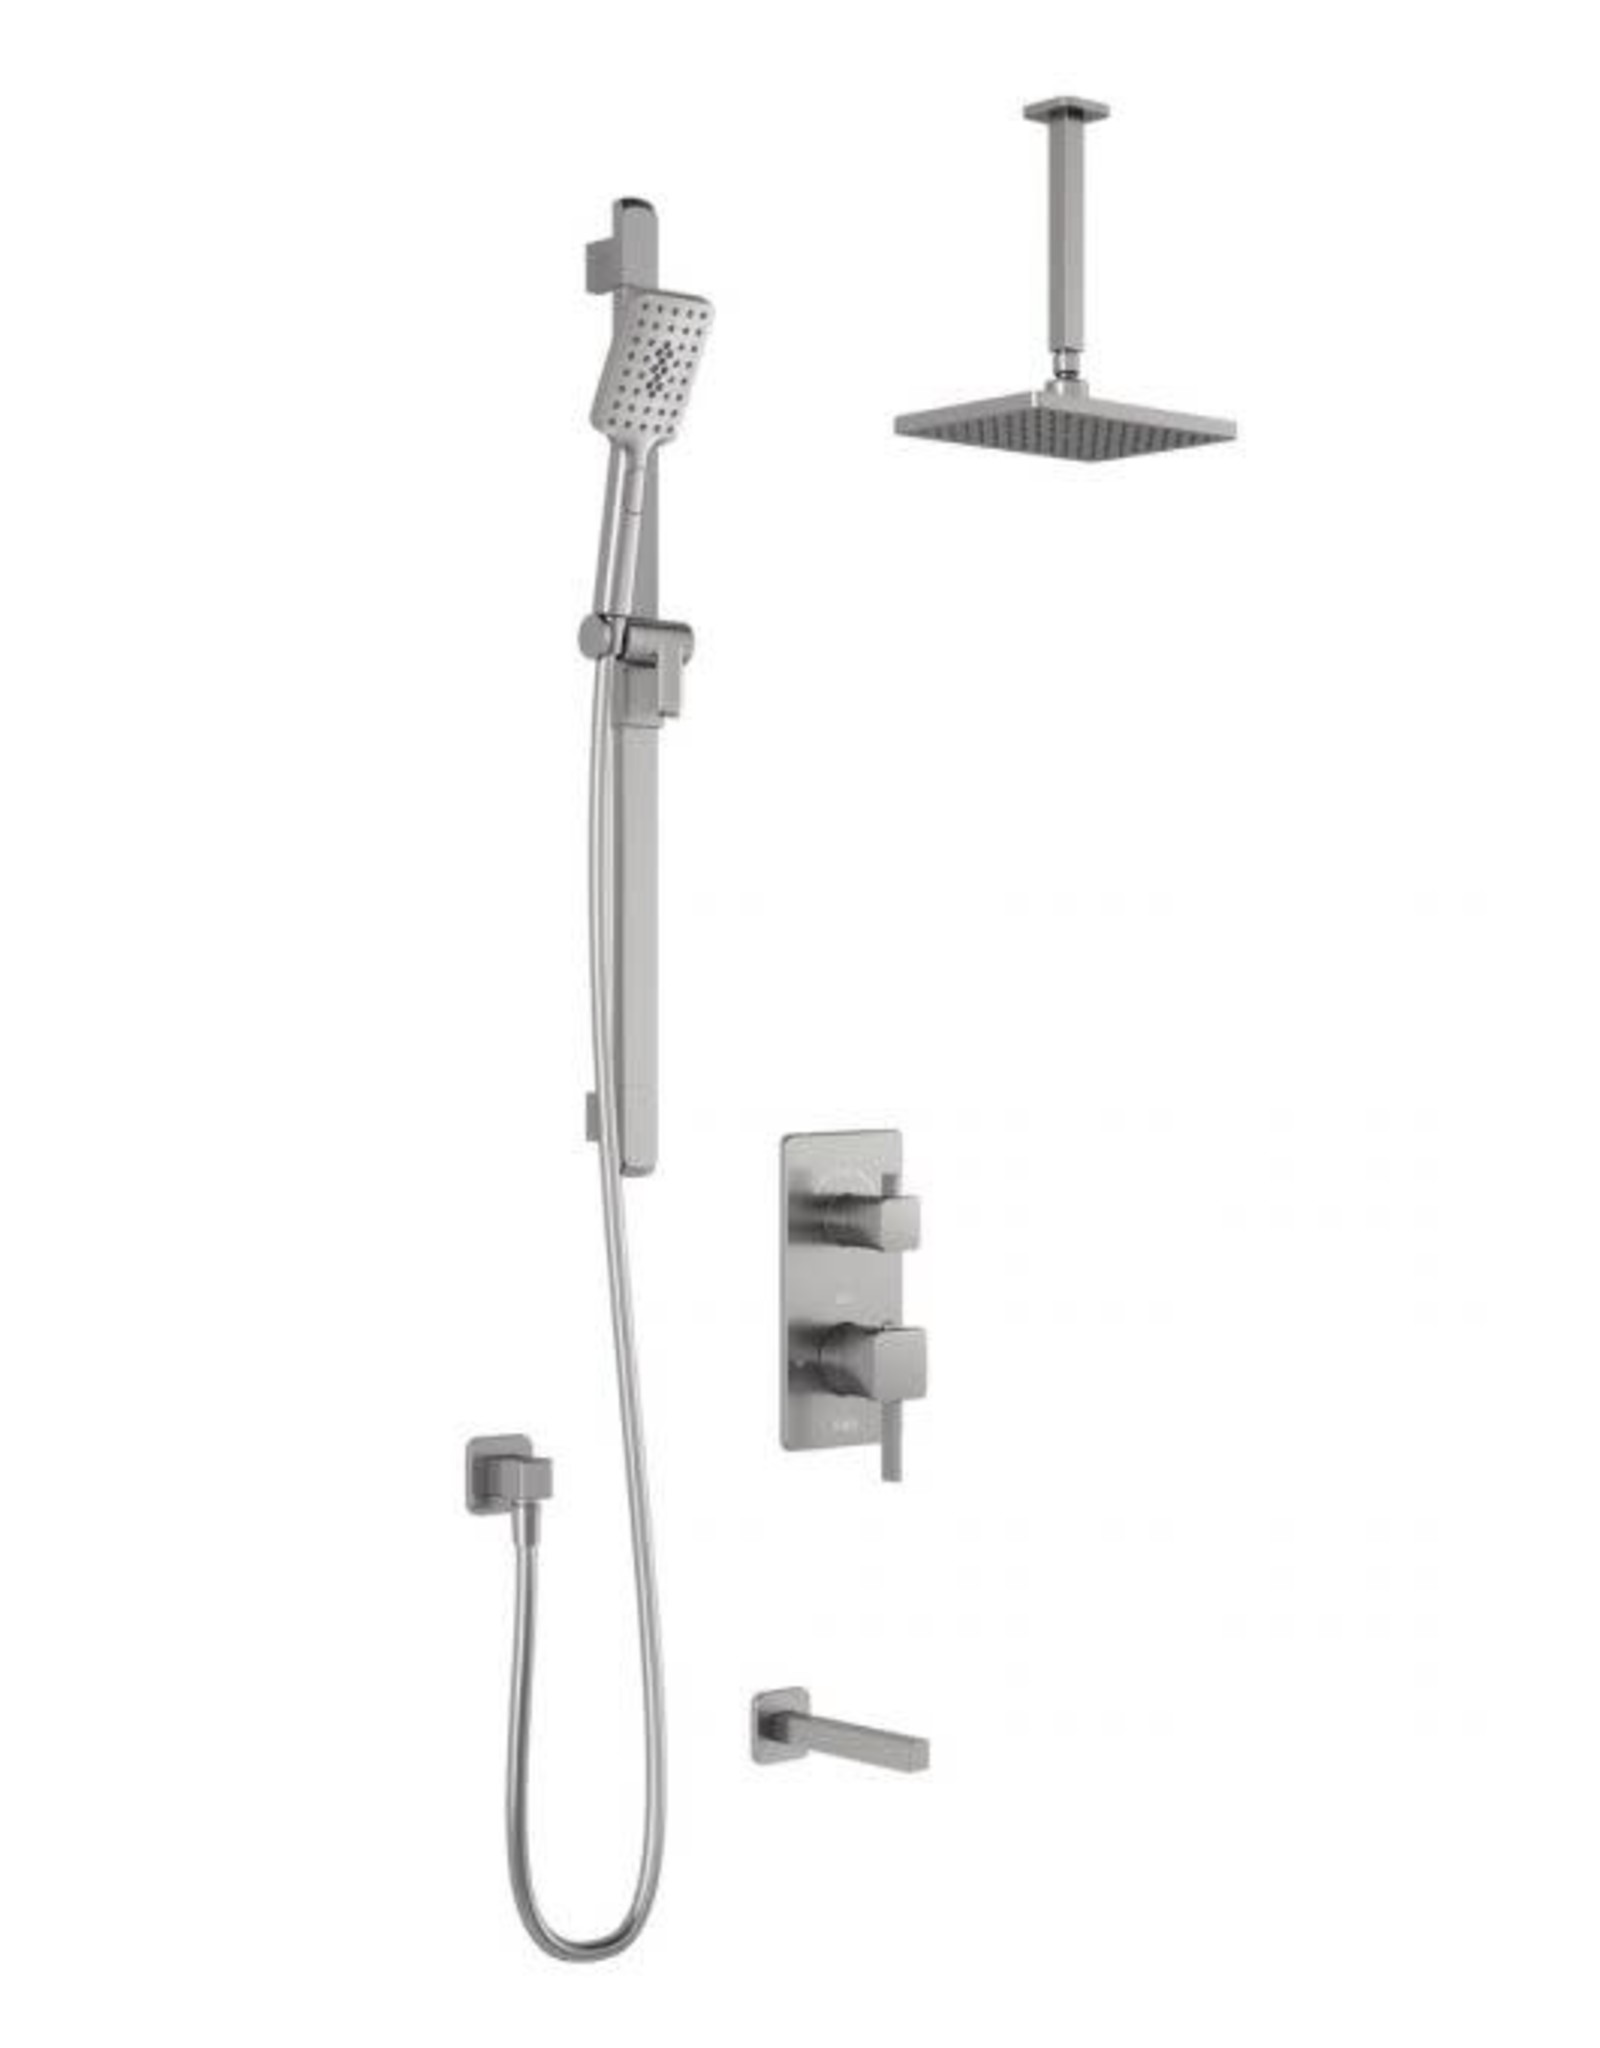 Kalia SqaureOne 3-Way Thermostatic Shower Kit w/ Ceiling Arm- Pure Nickel